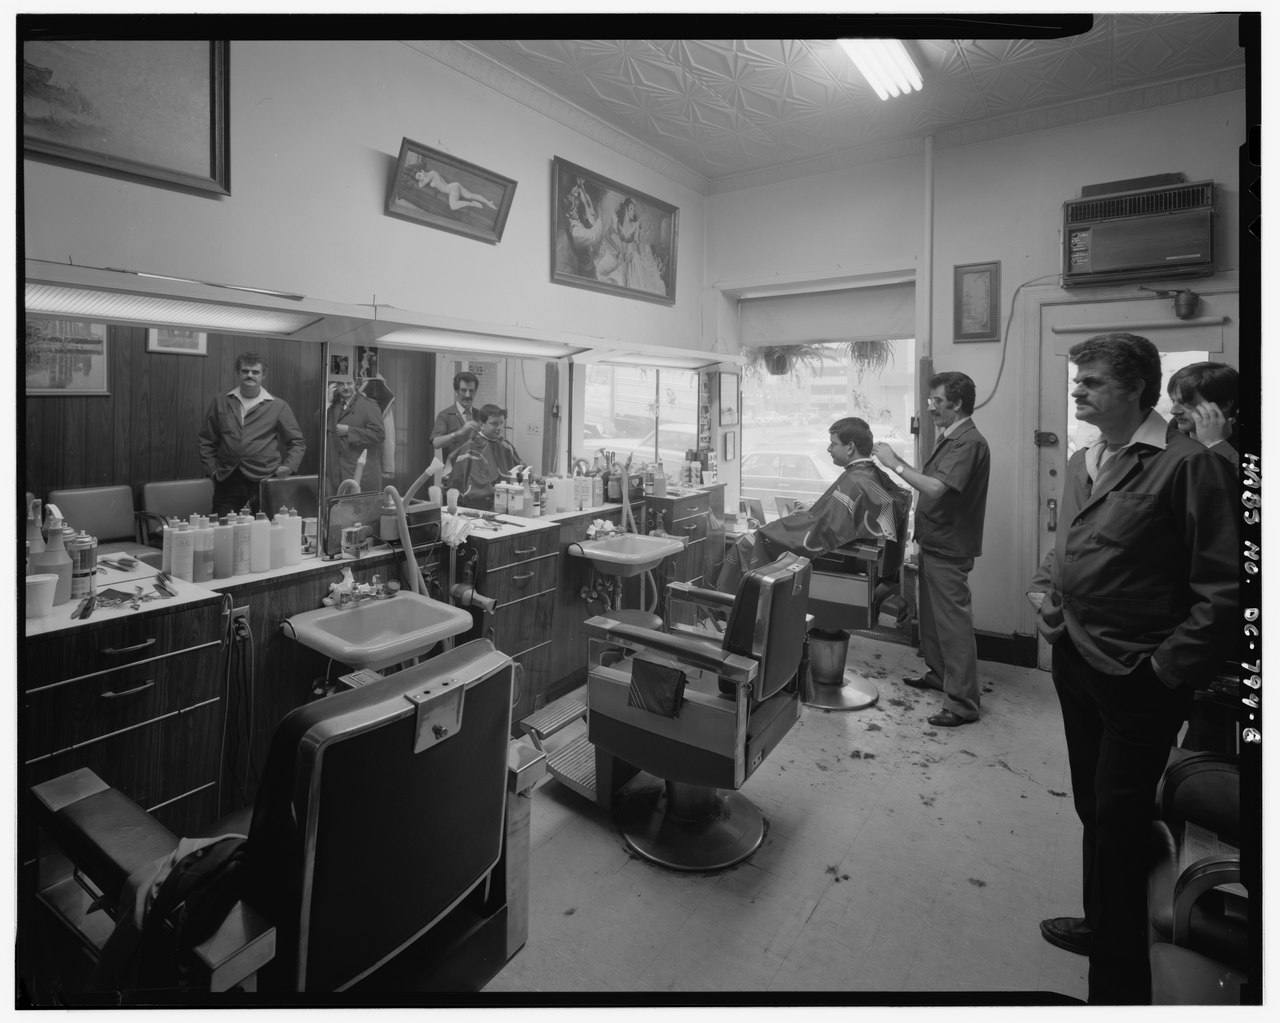 Barber shop interior images joy studio design gallery best design - Barber shop interior ...